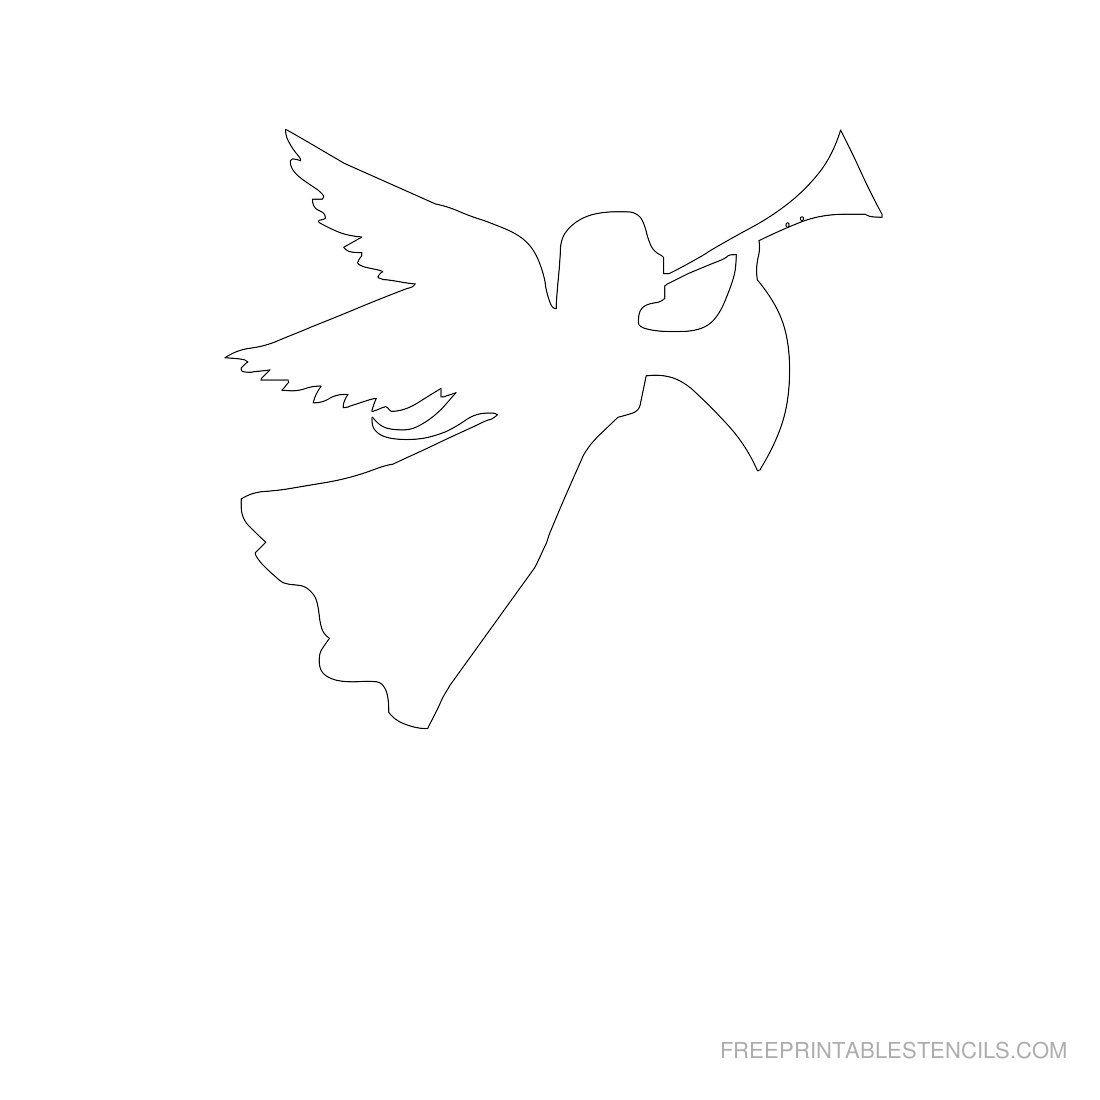 Pinstephanie Bargelski On Angels   Pinterest   Free Stencils - Free Printable Angels